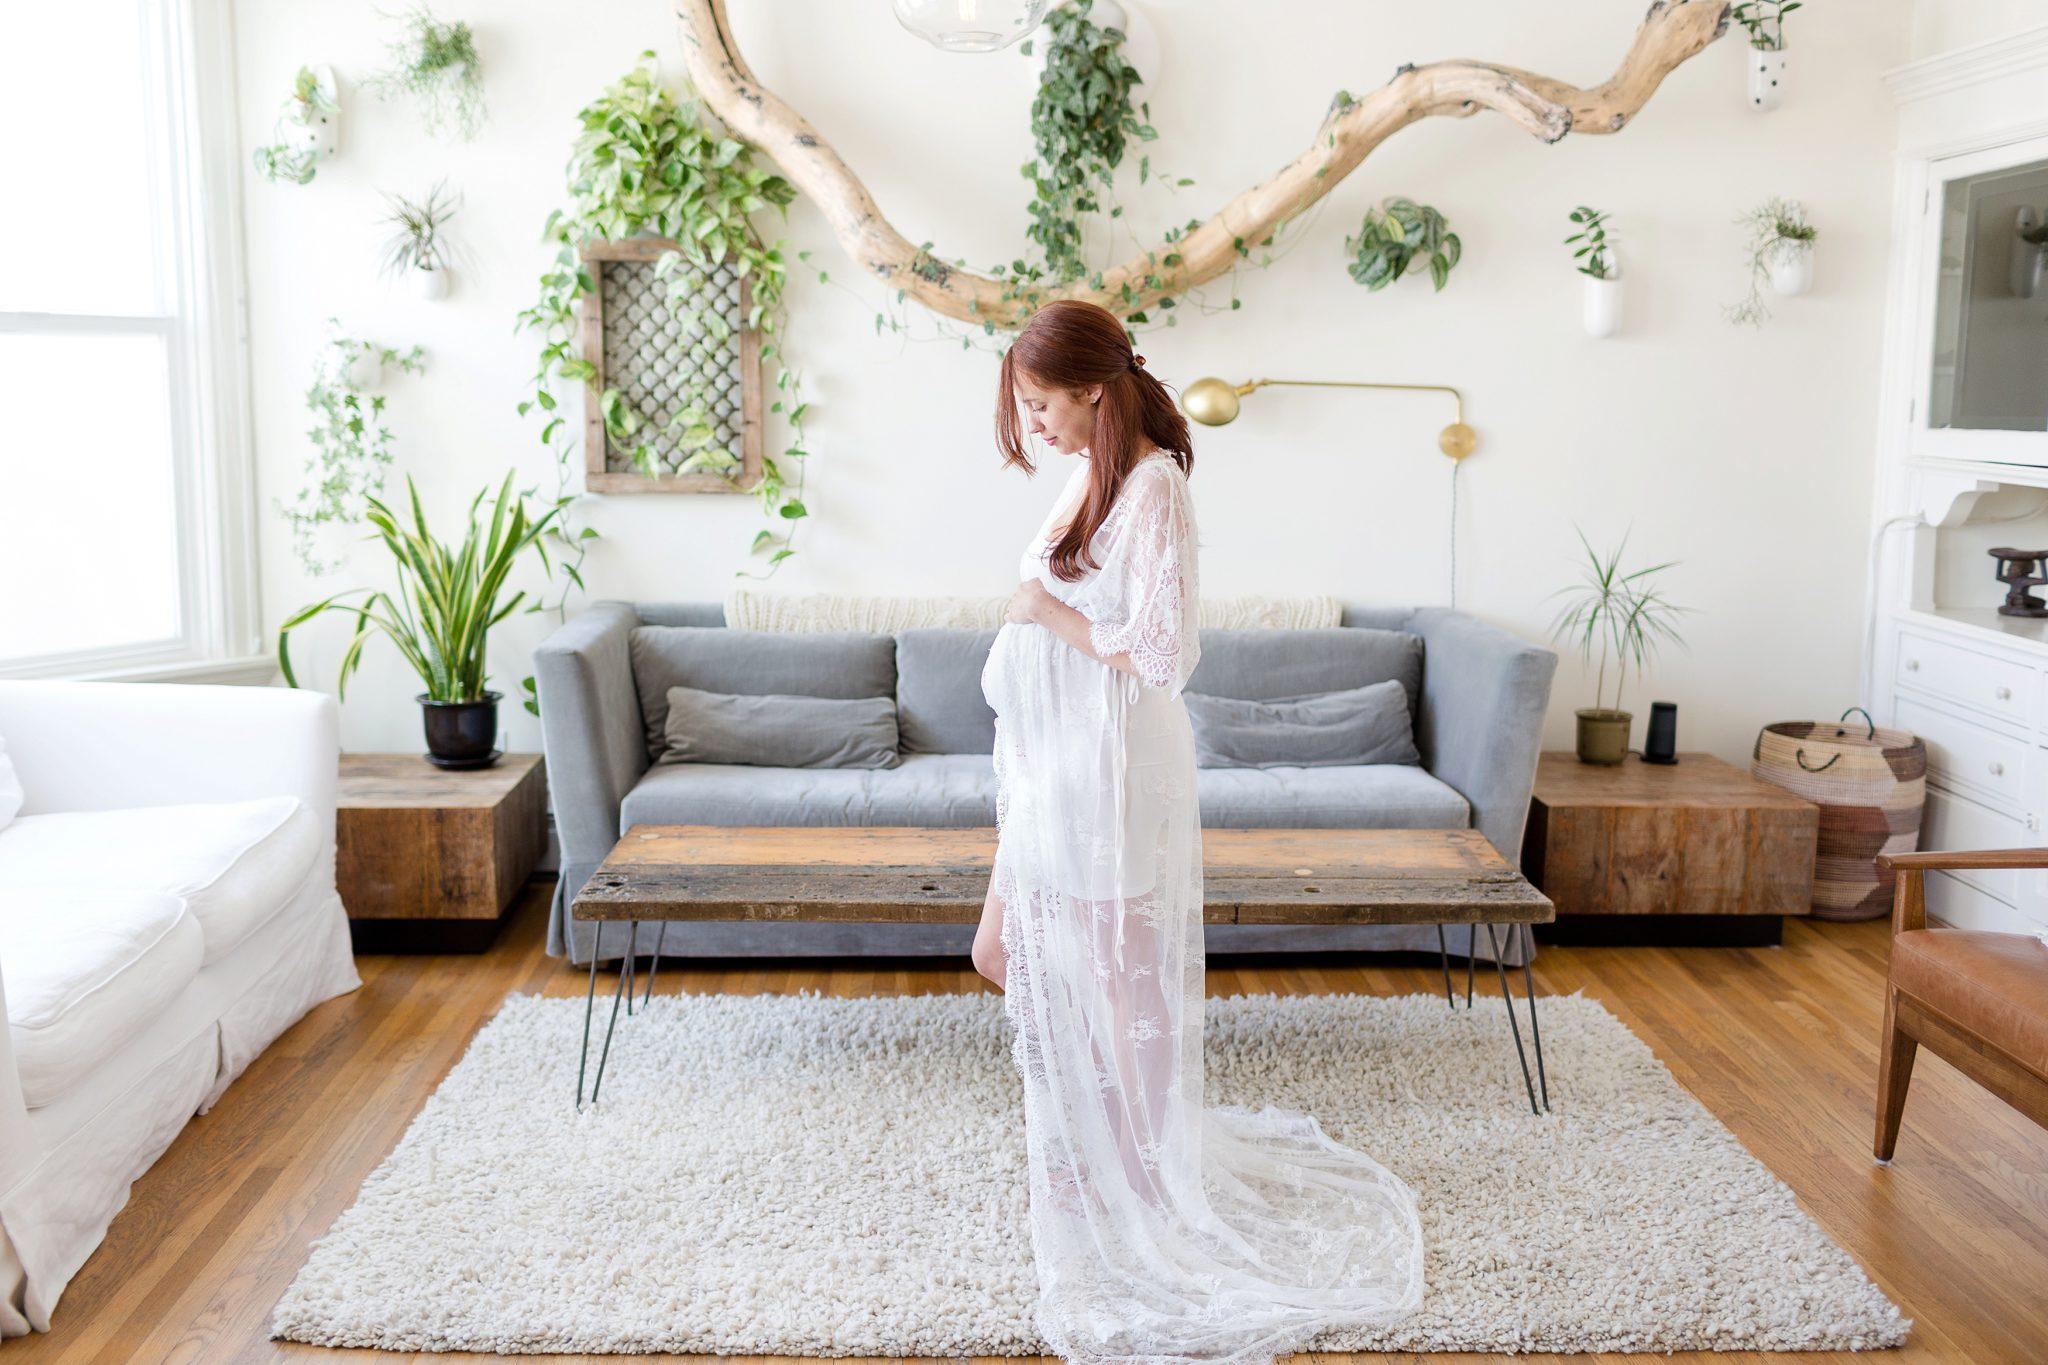 kyla_maternity_gallery_10